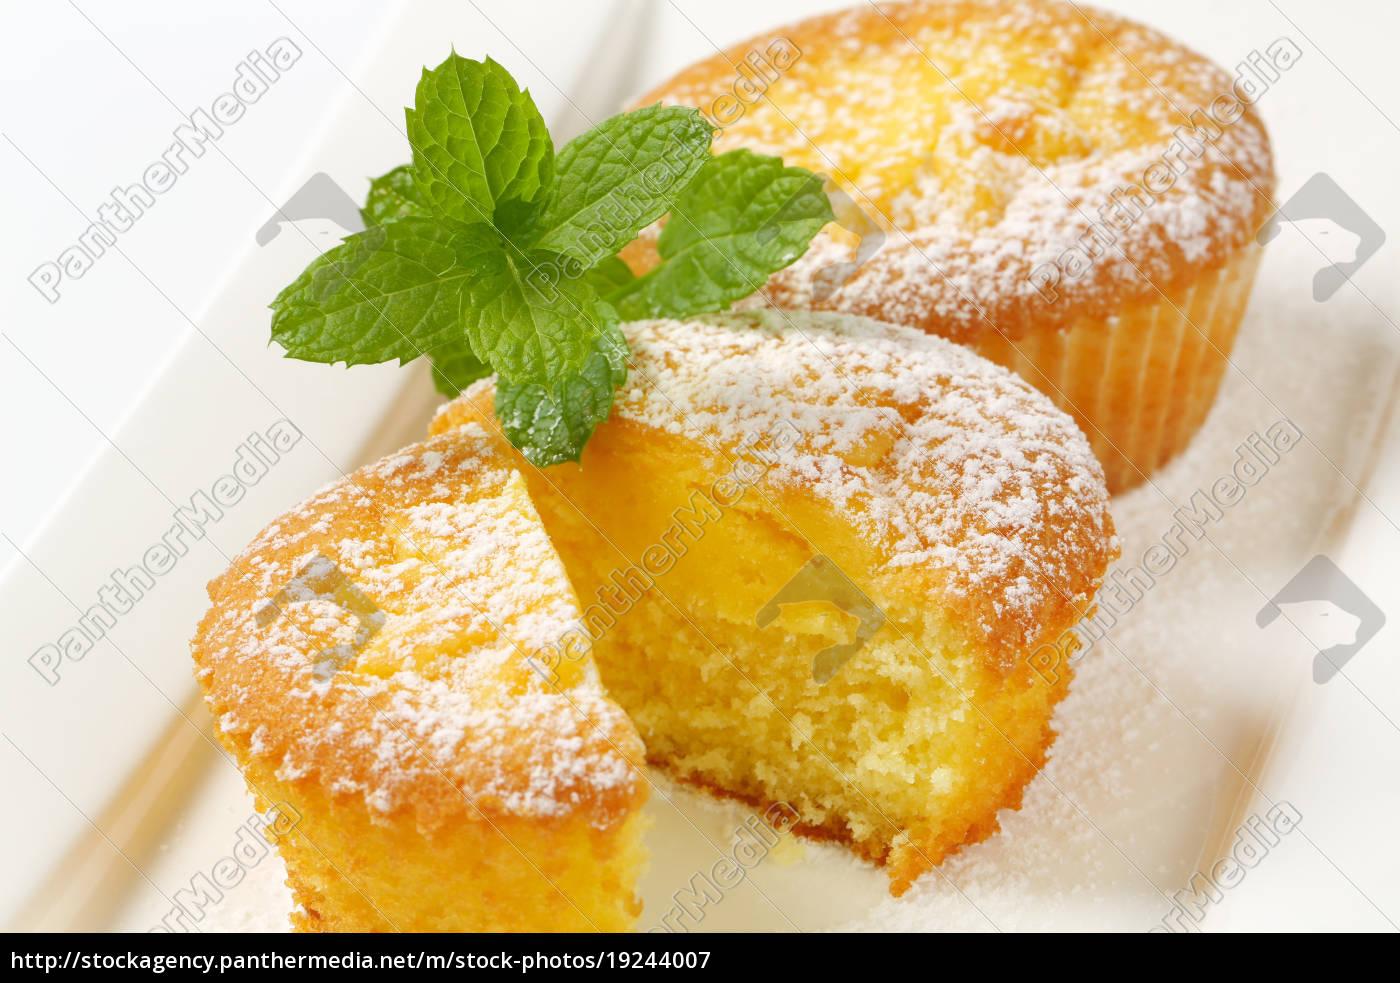 pudding, filled, lemon, cupcakes - 19244007